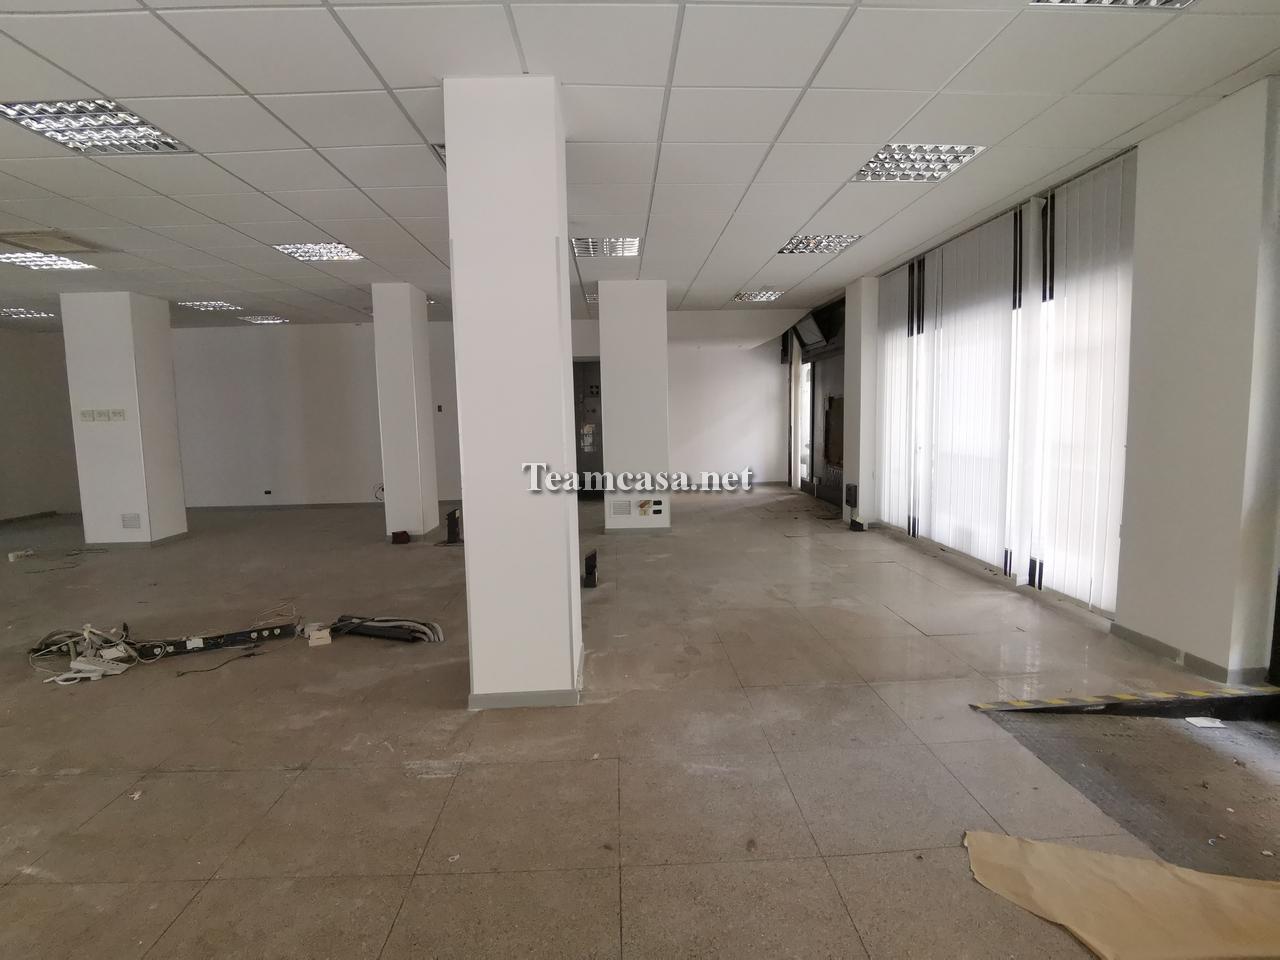 Negozio 6 locali in affitto a Pesaro (PU)